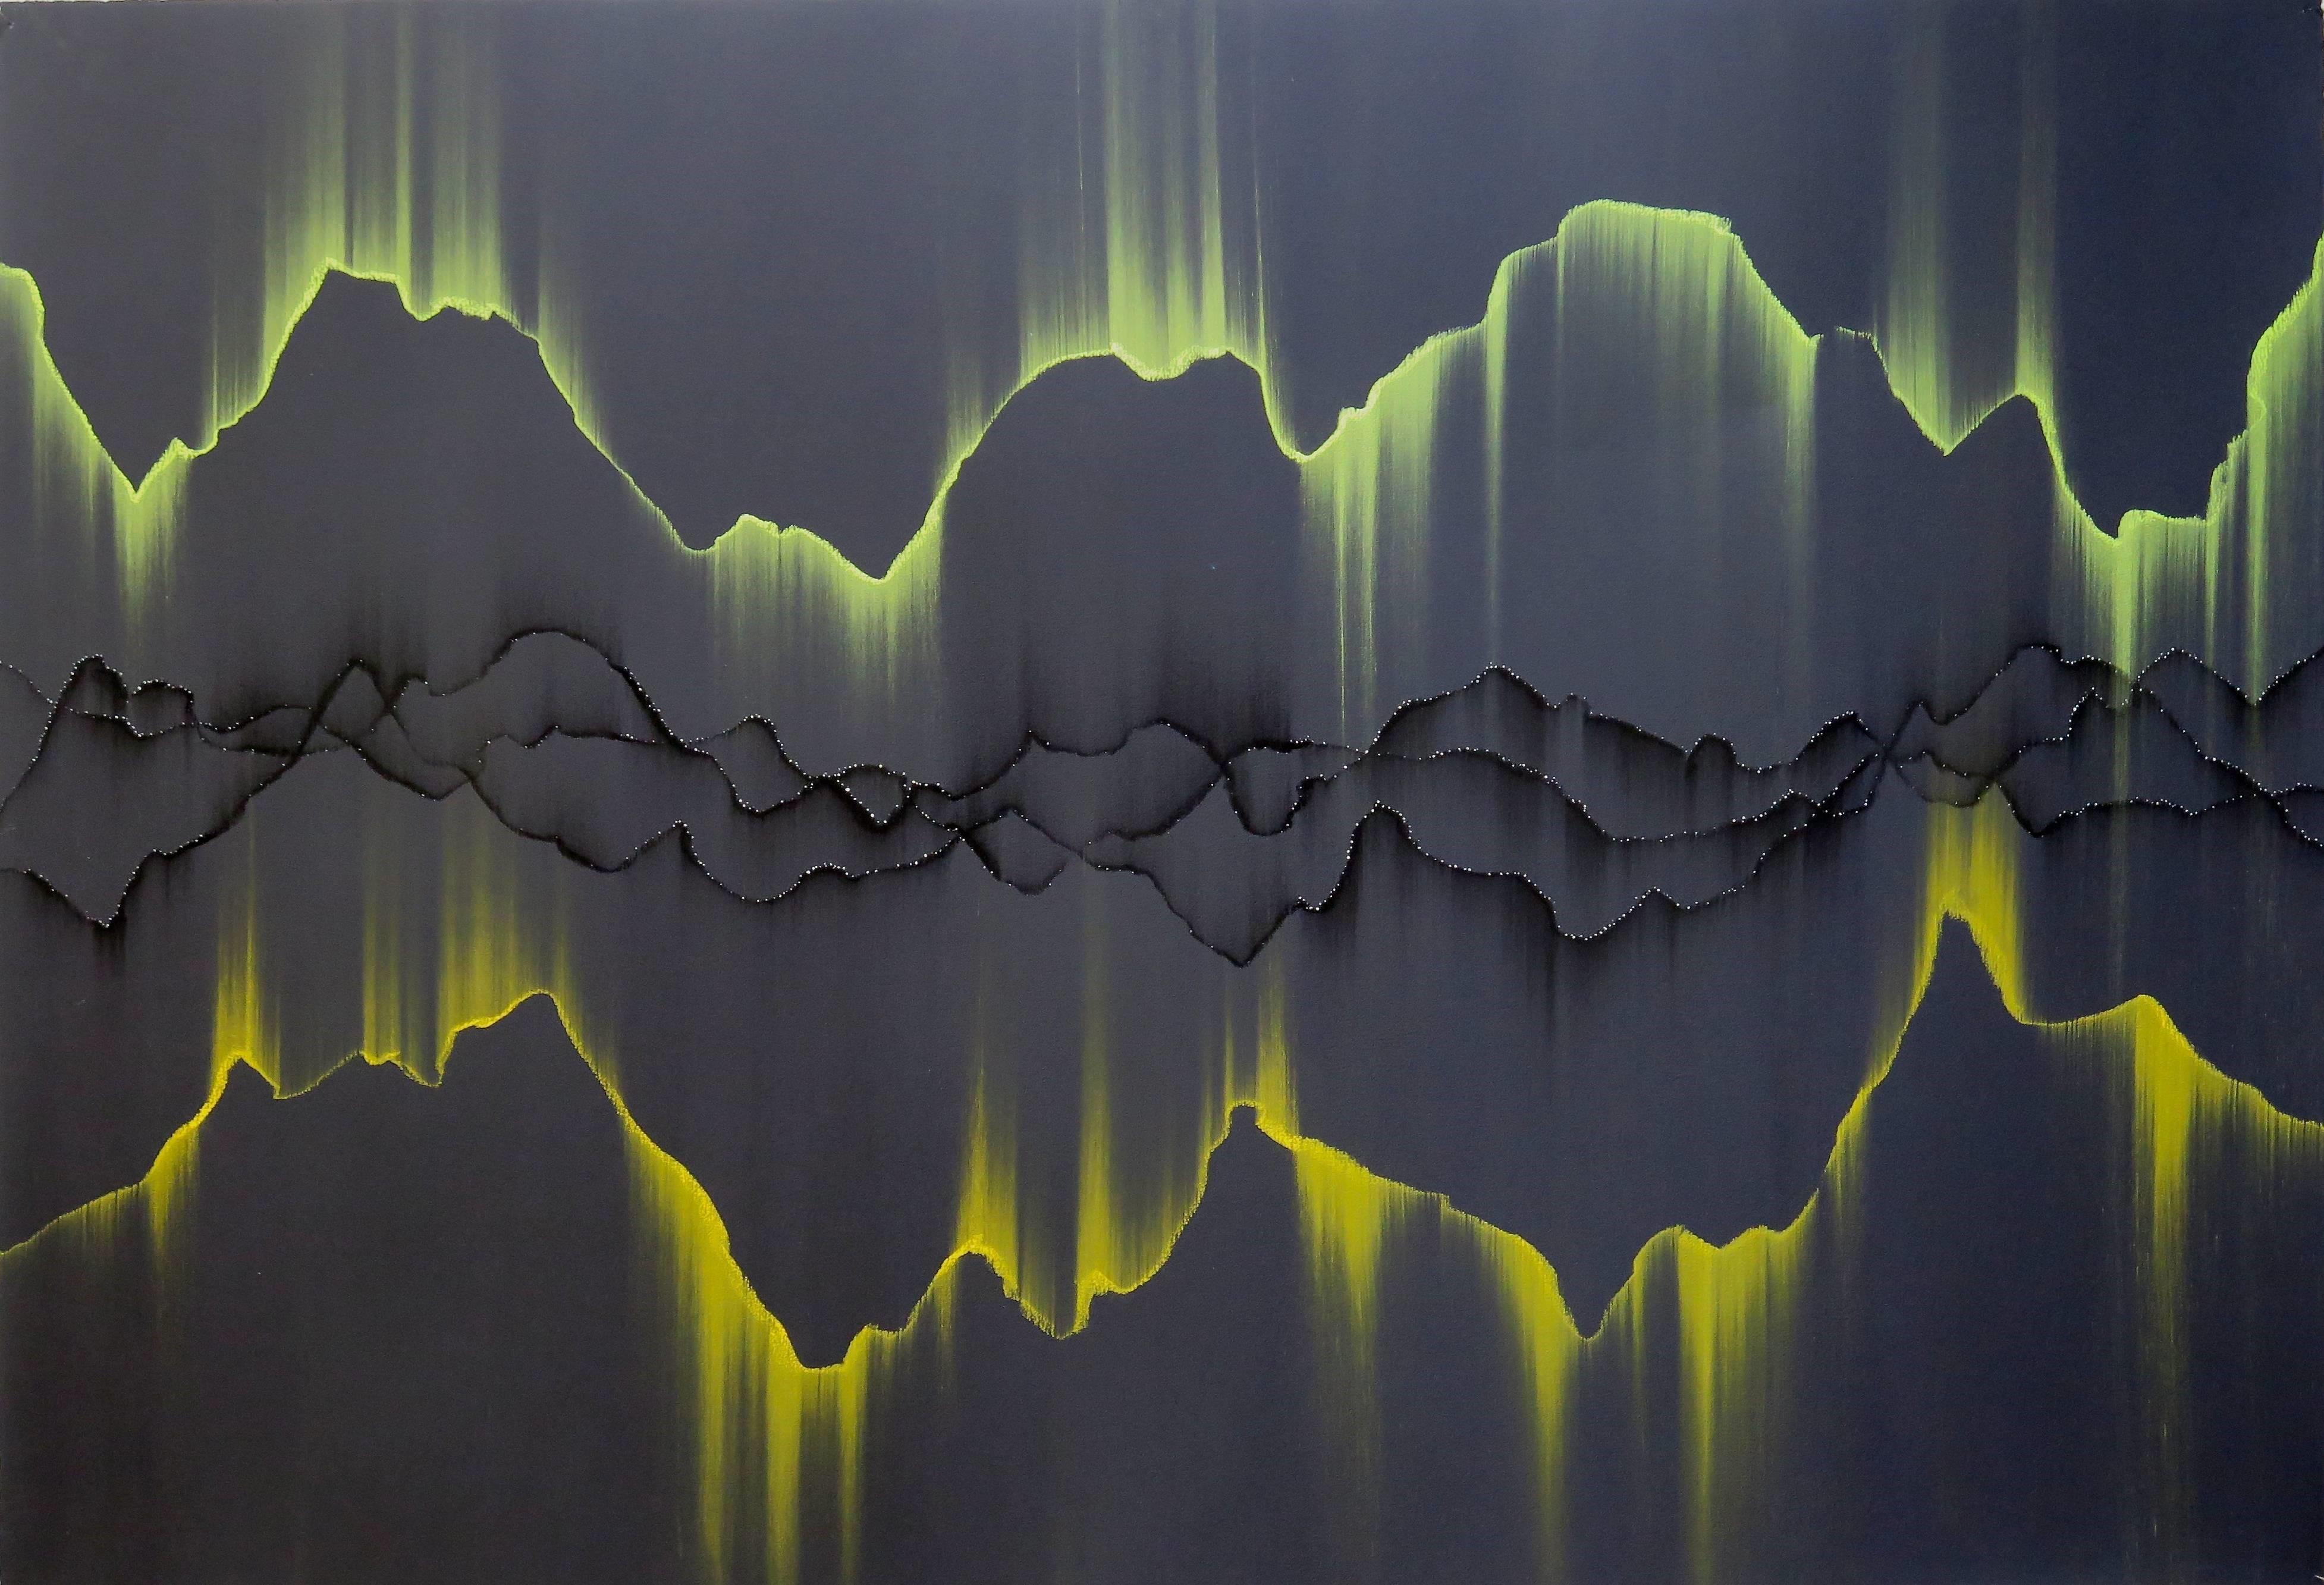 Kristin Skrivervik, Waves of sorrow and hope